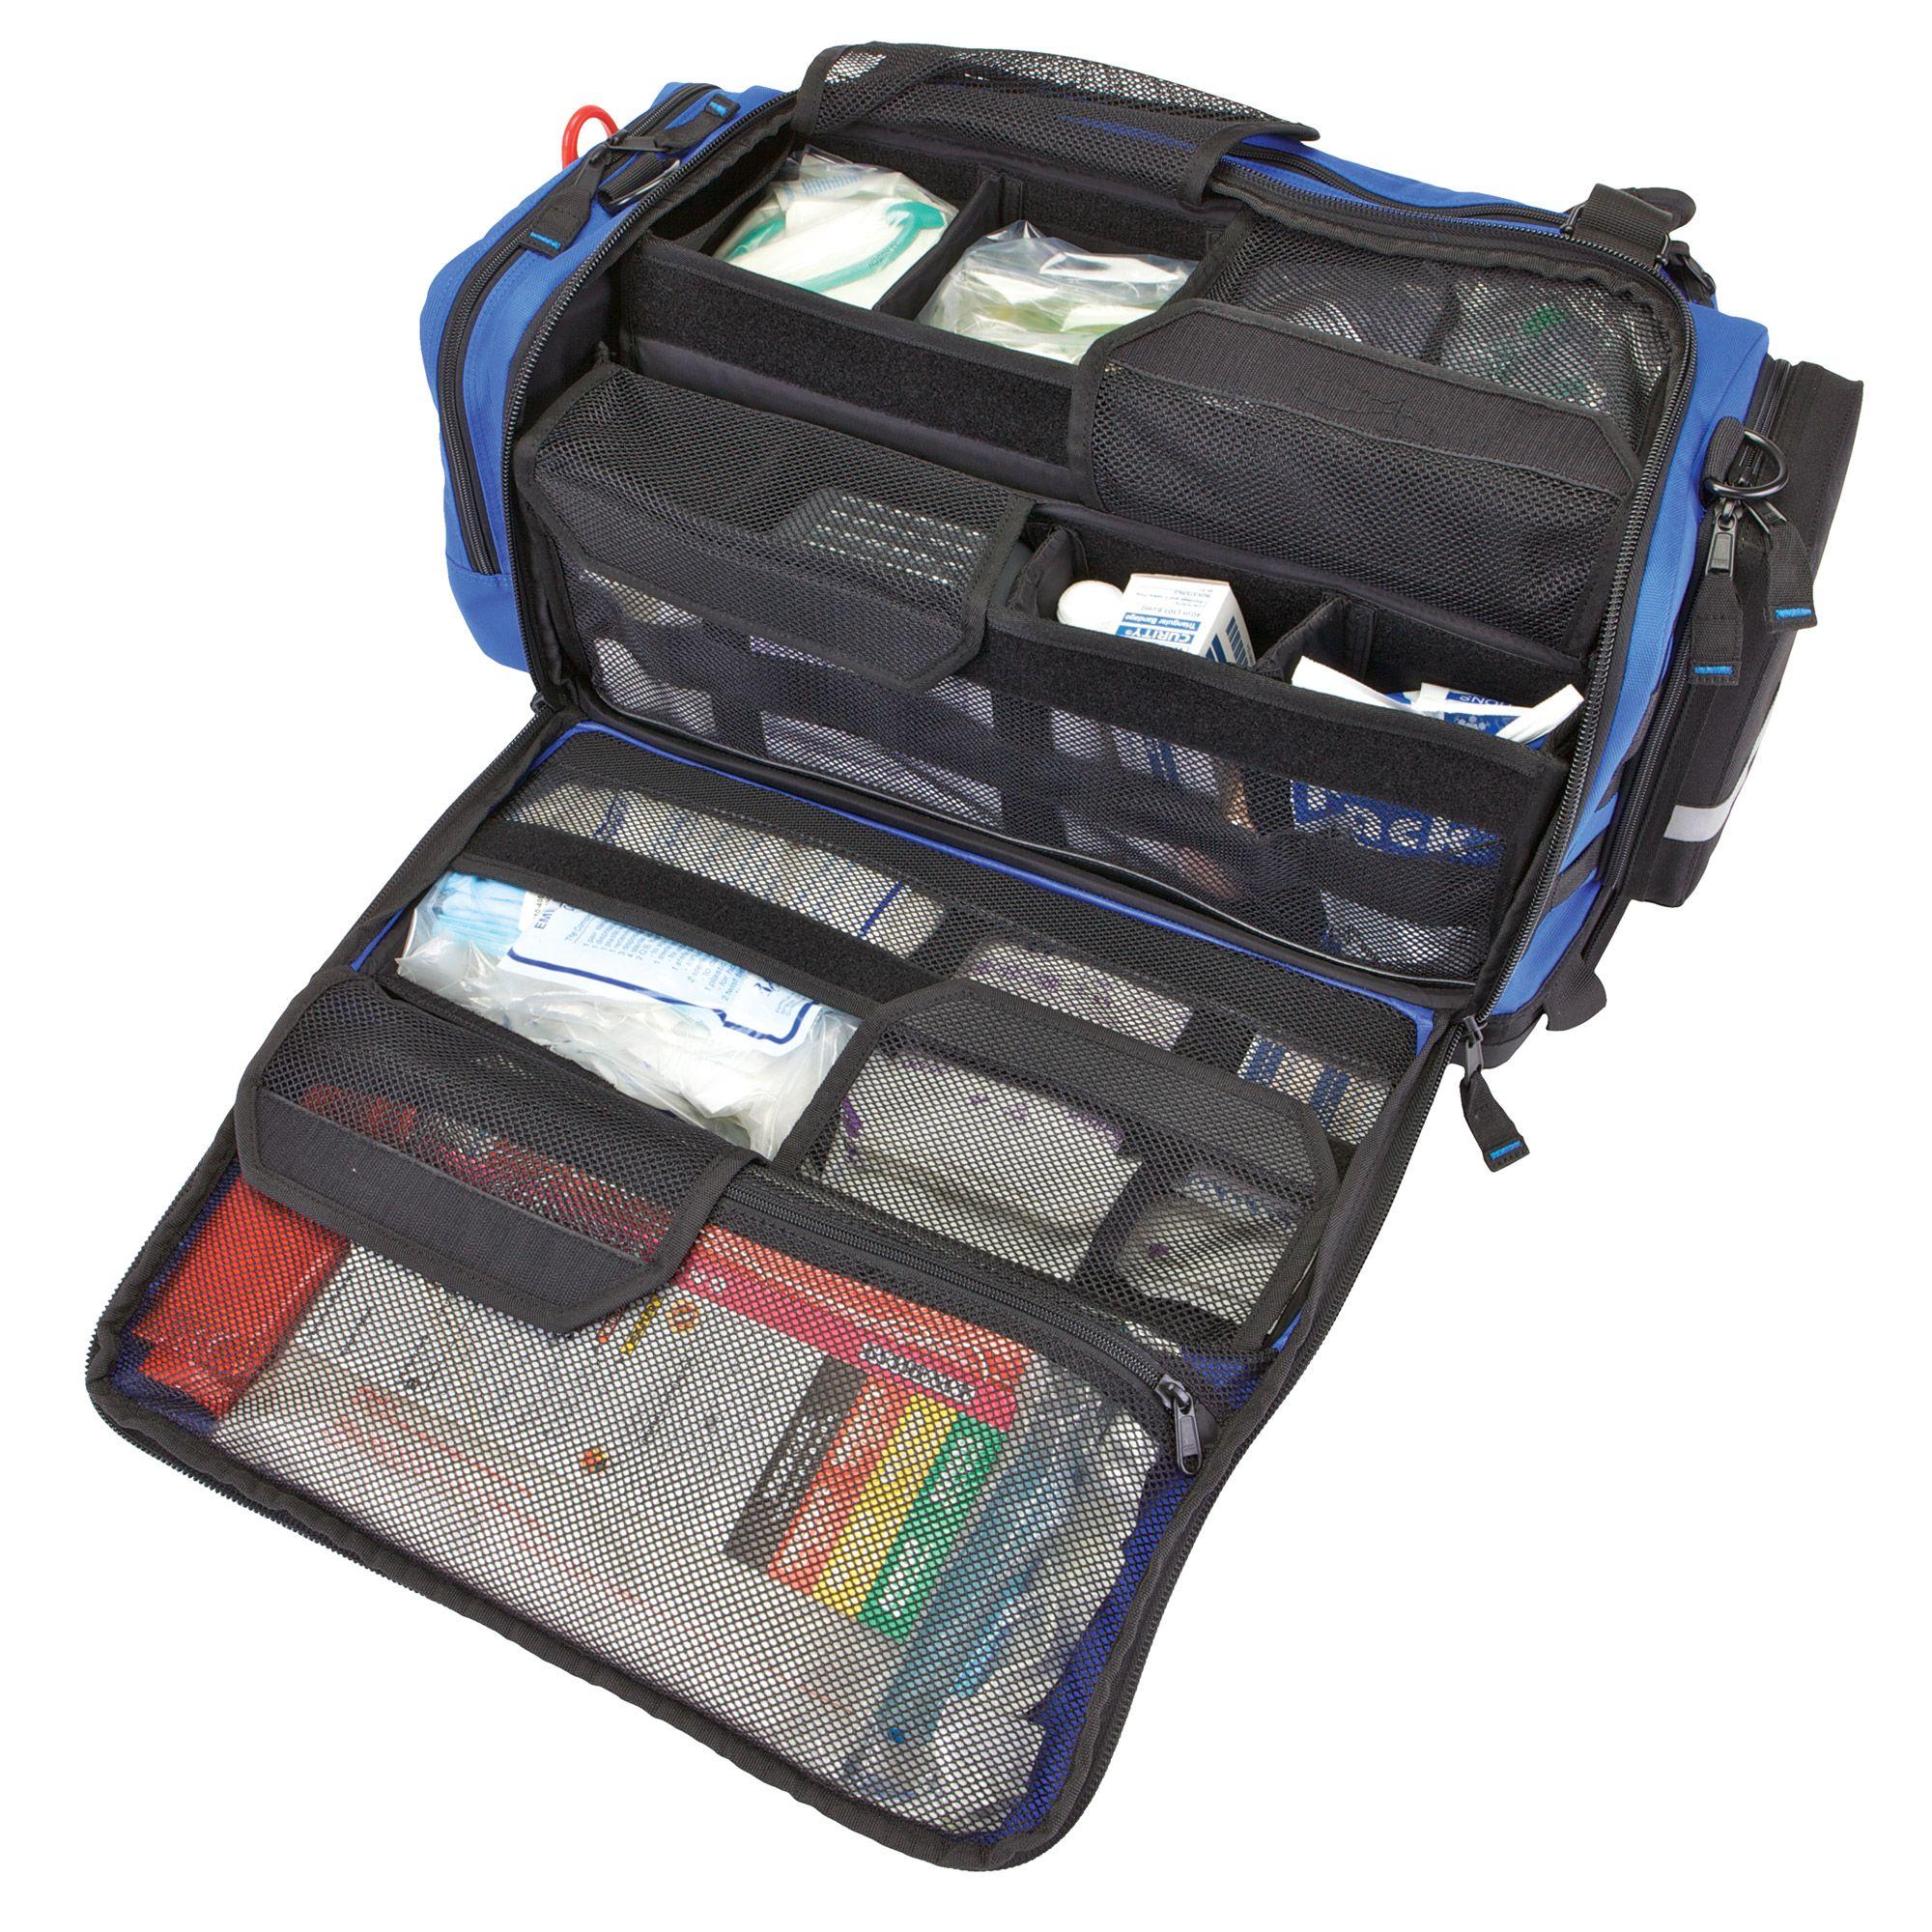 5 11 Tactical Responder Bls 2000 Ems Bag Official Site